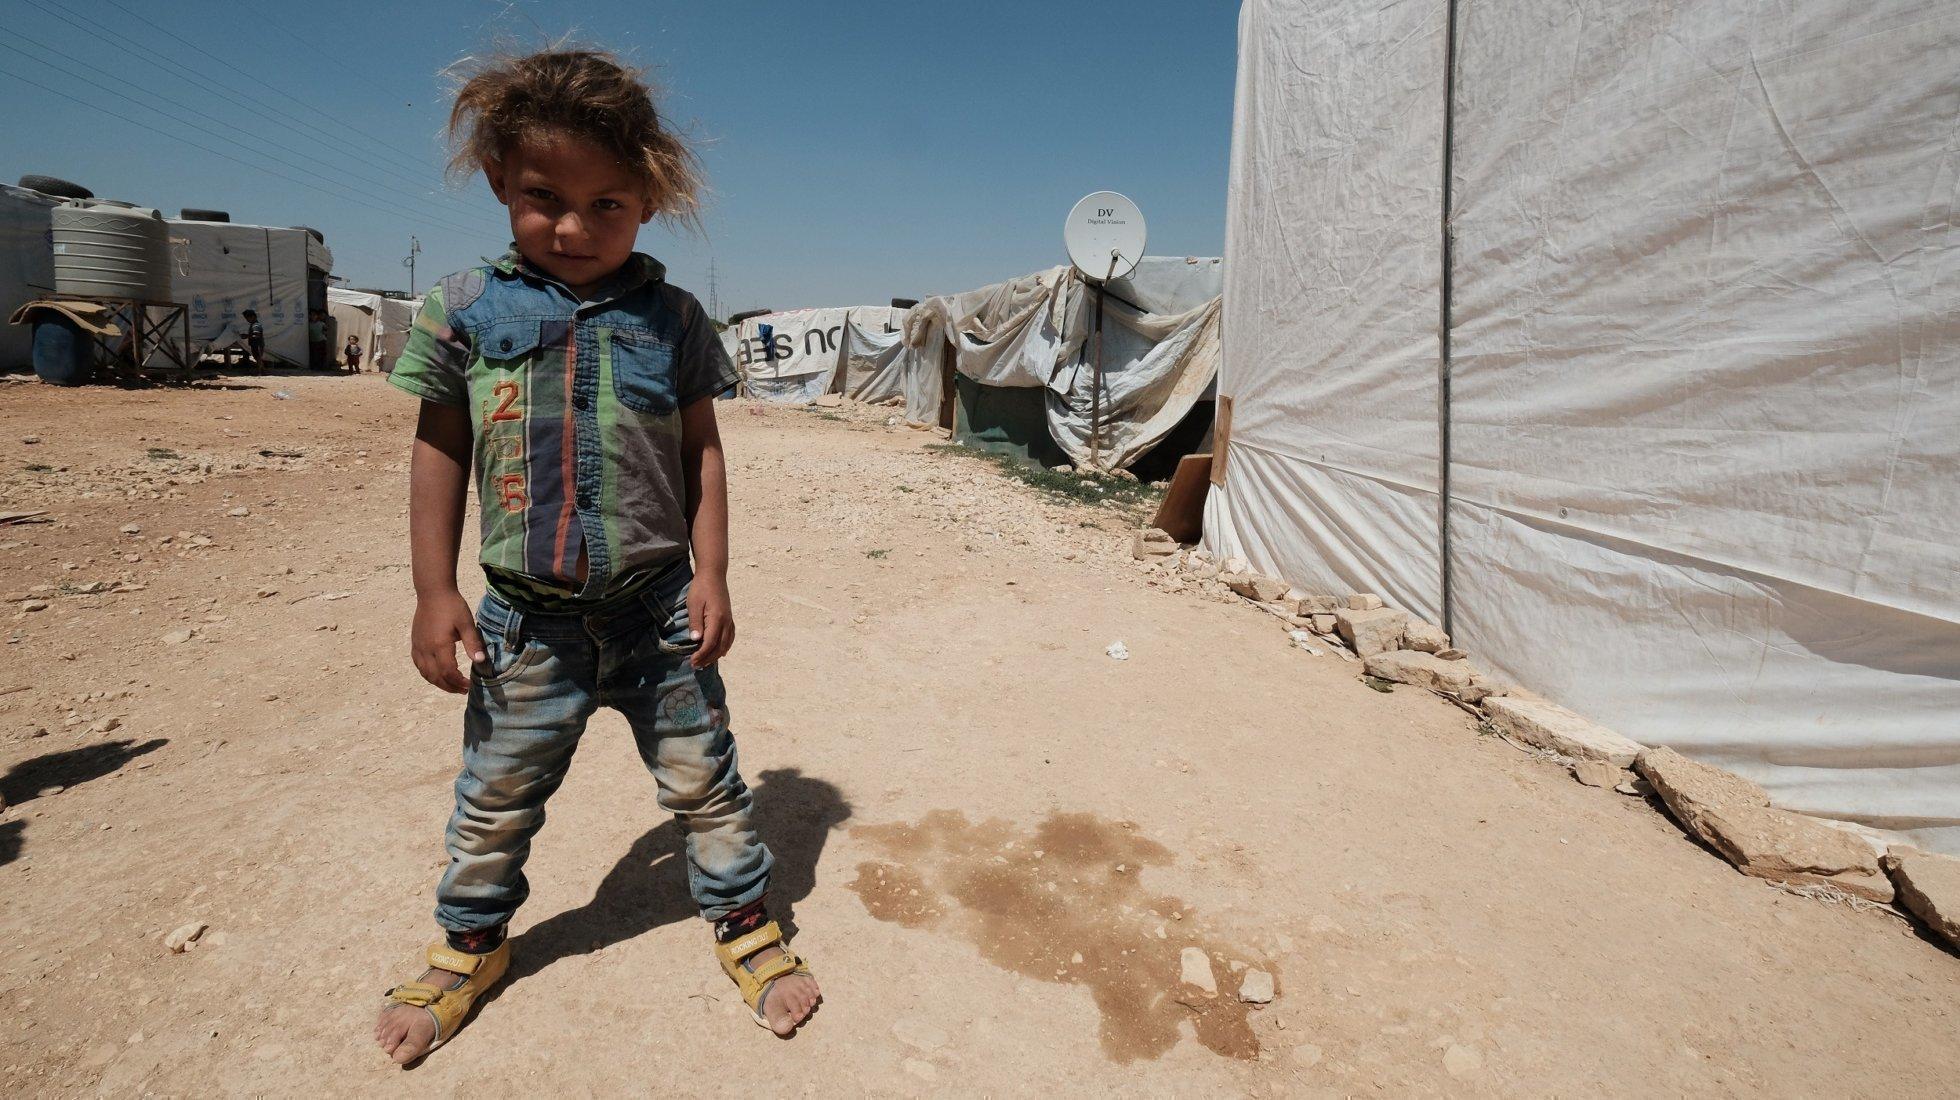 Vergessene Katastrophen, vergessene Kinder